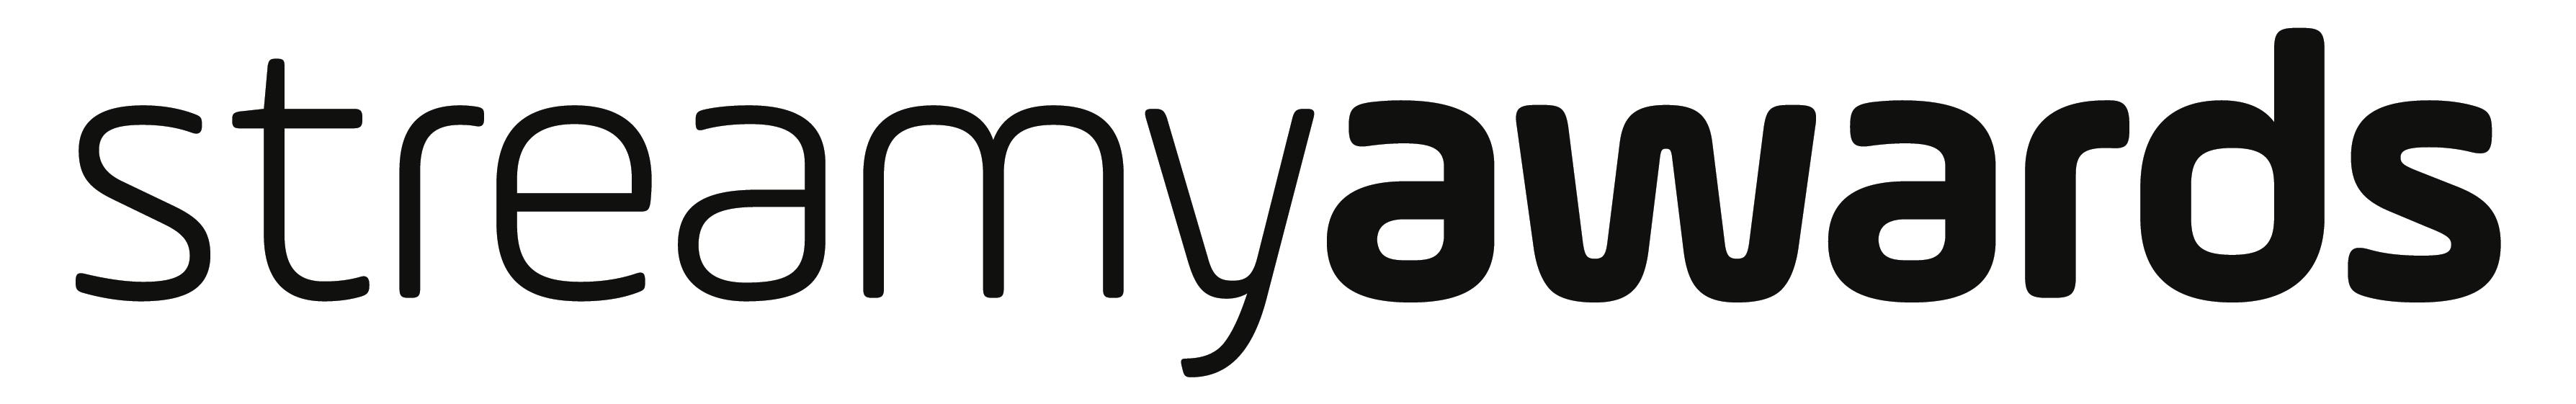 2016_Streamys Logo_Horizontal